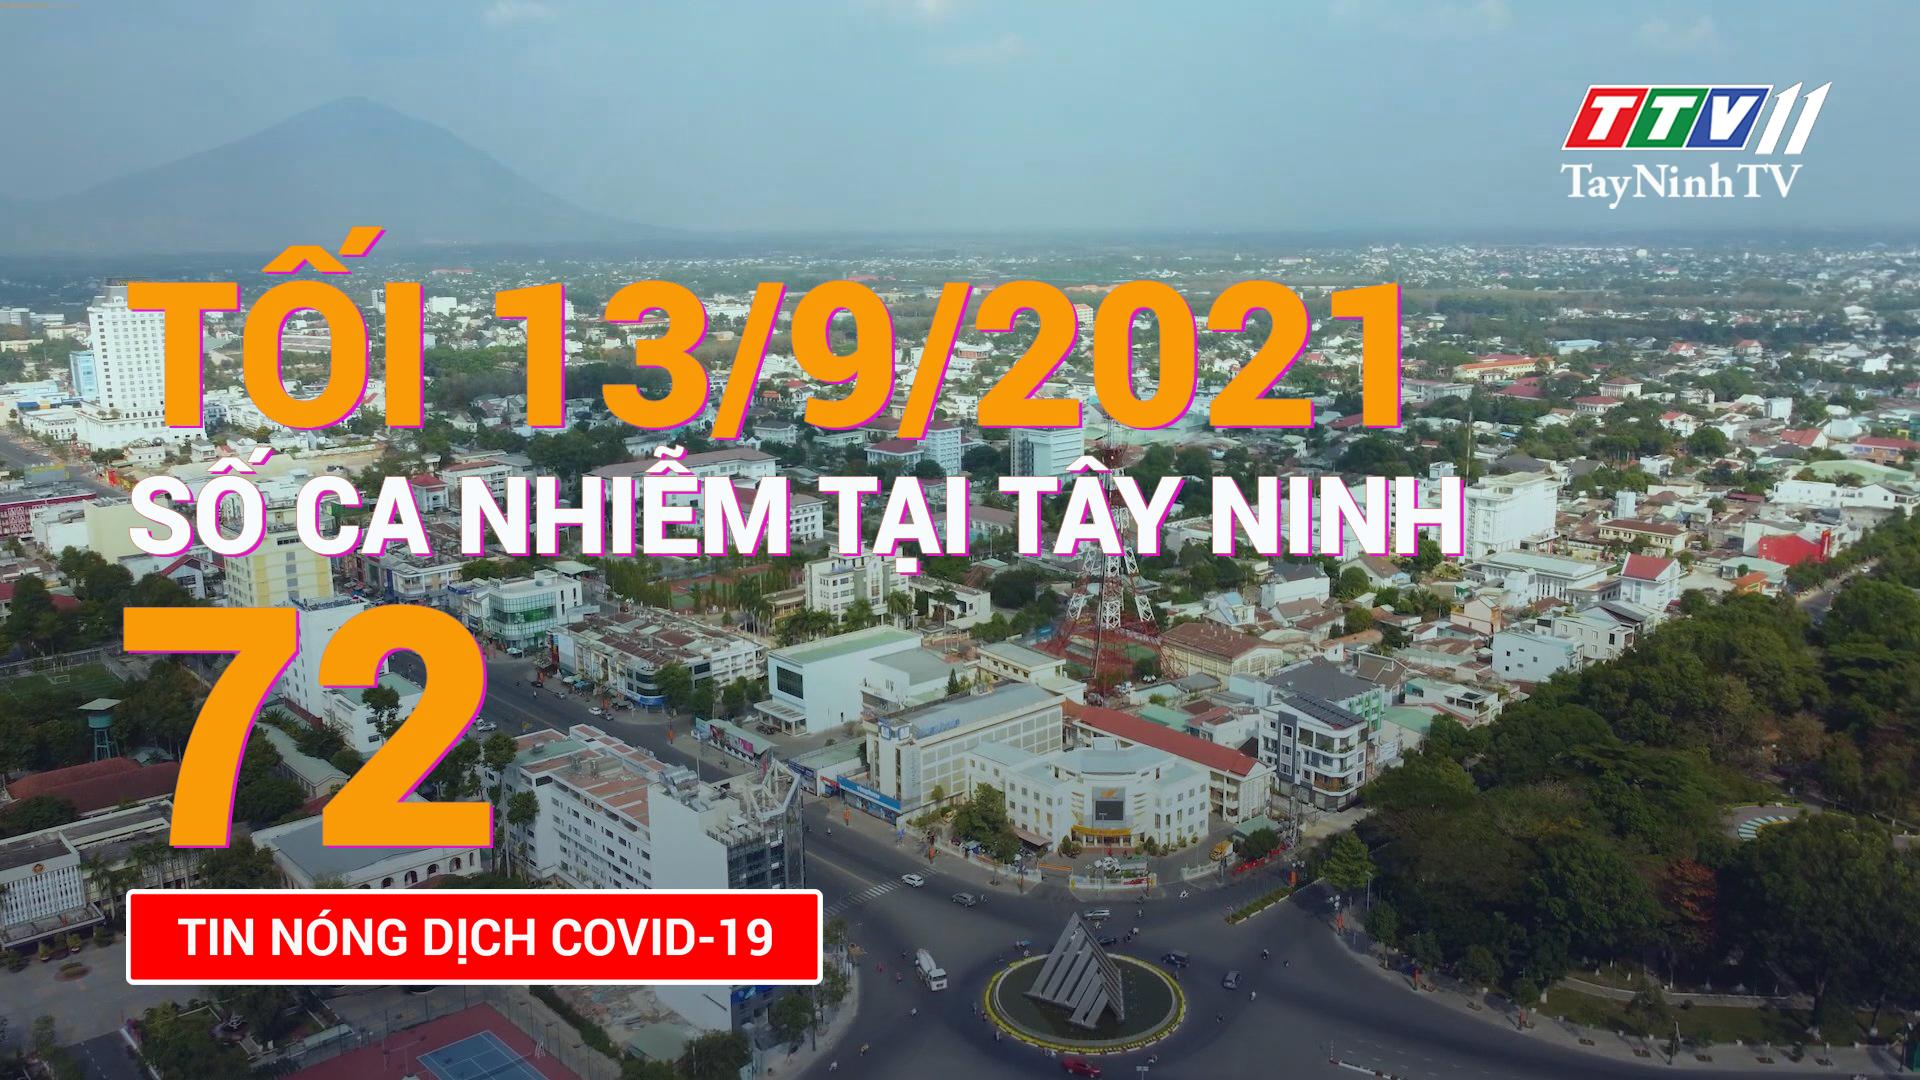 Tin tức Covid-19 tối 13/9/2021 | TayNinhTV